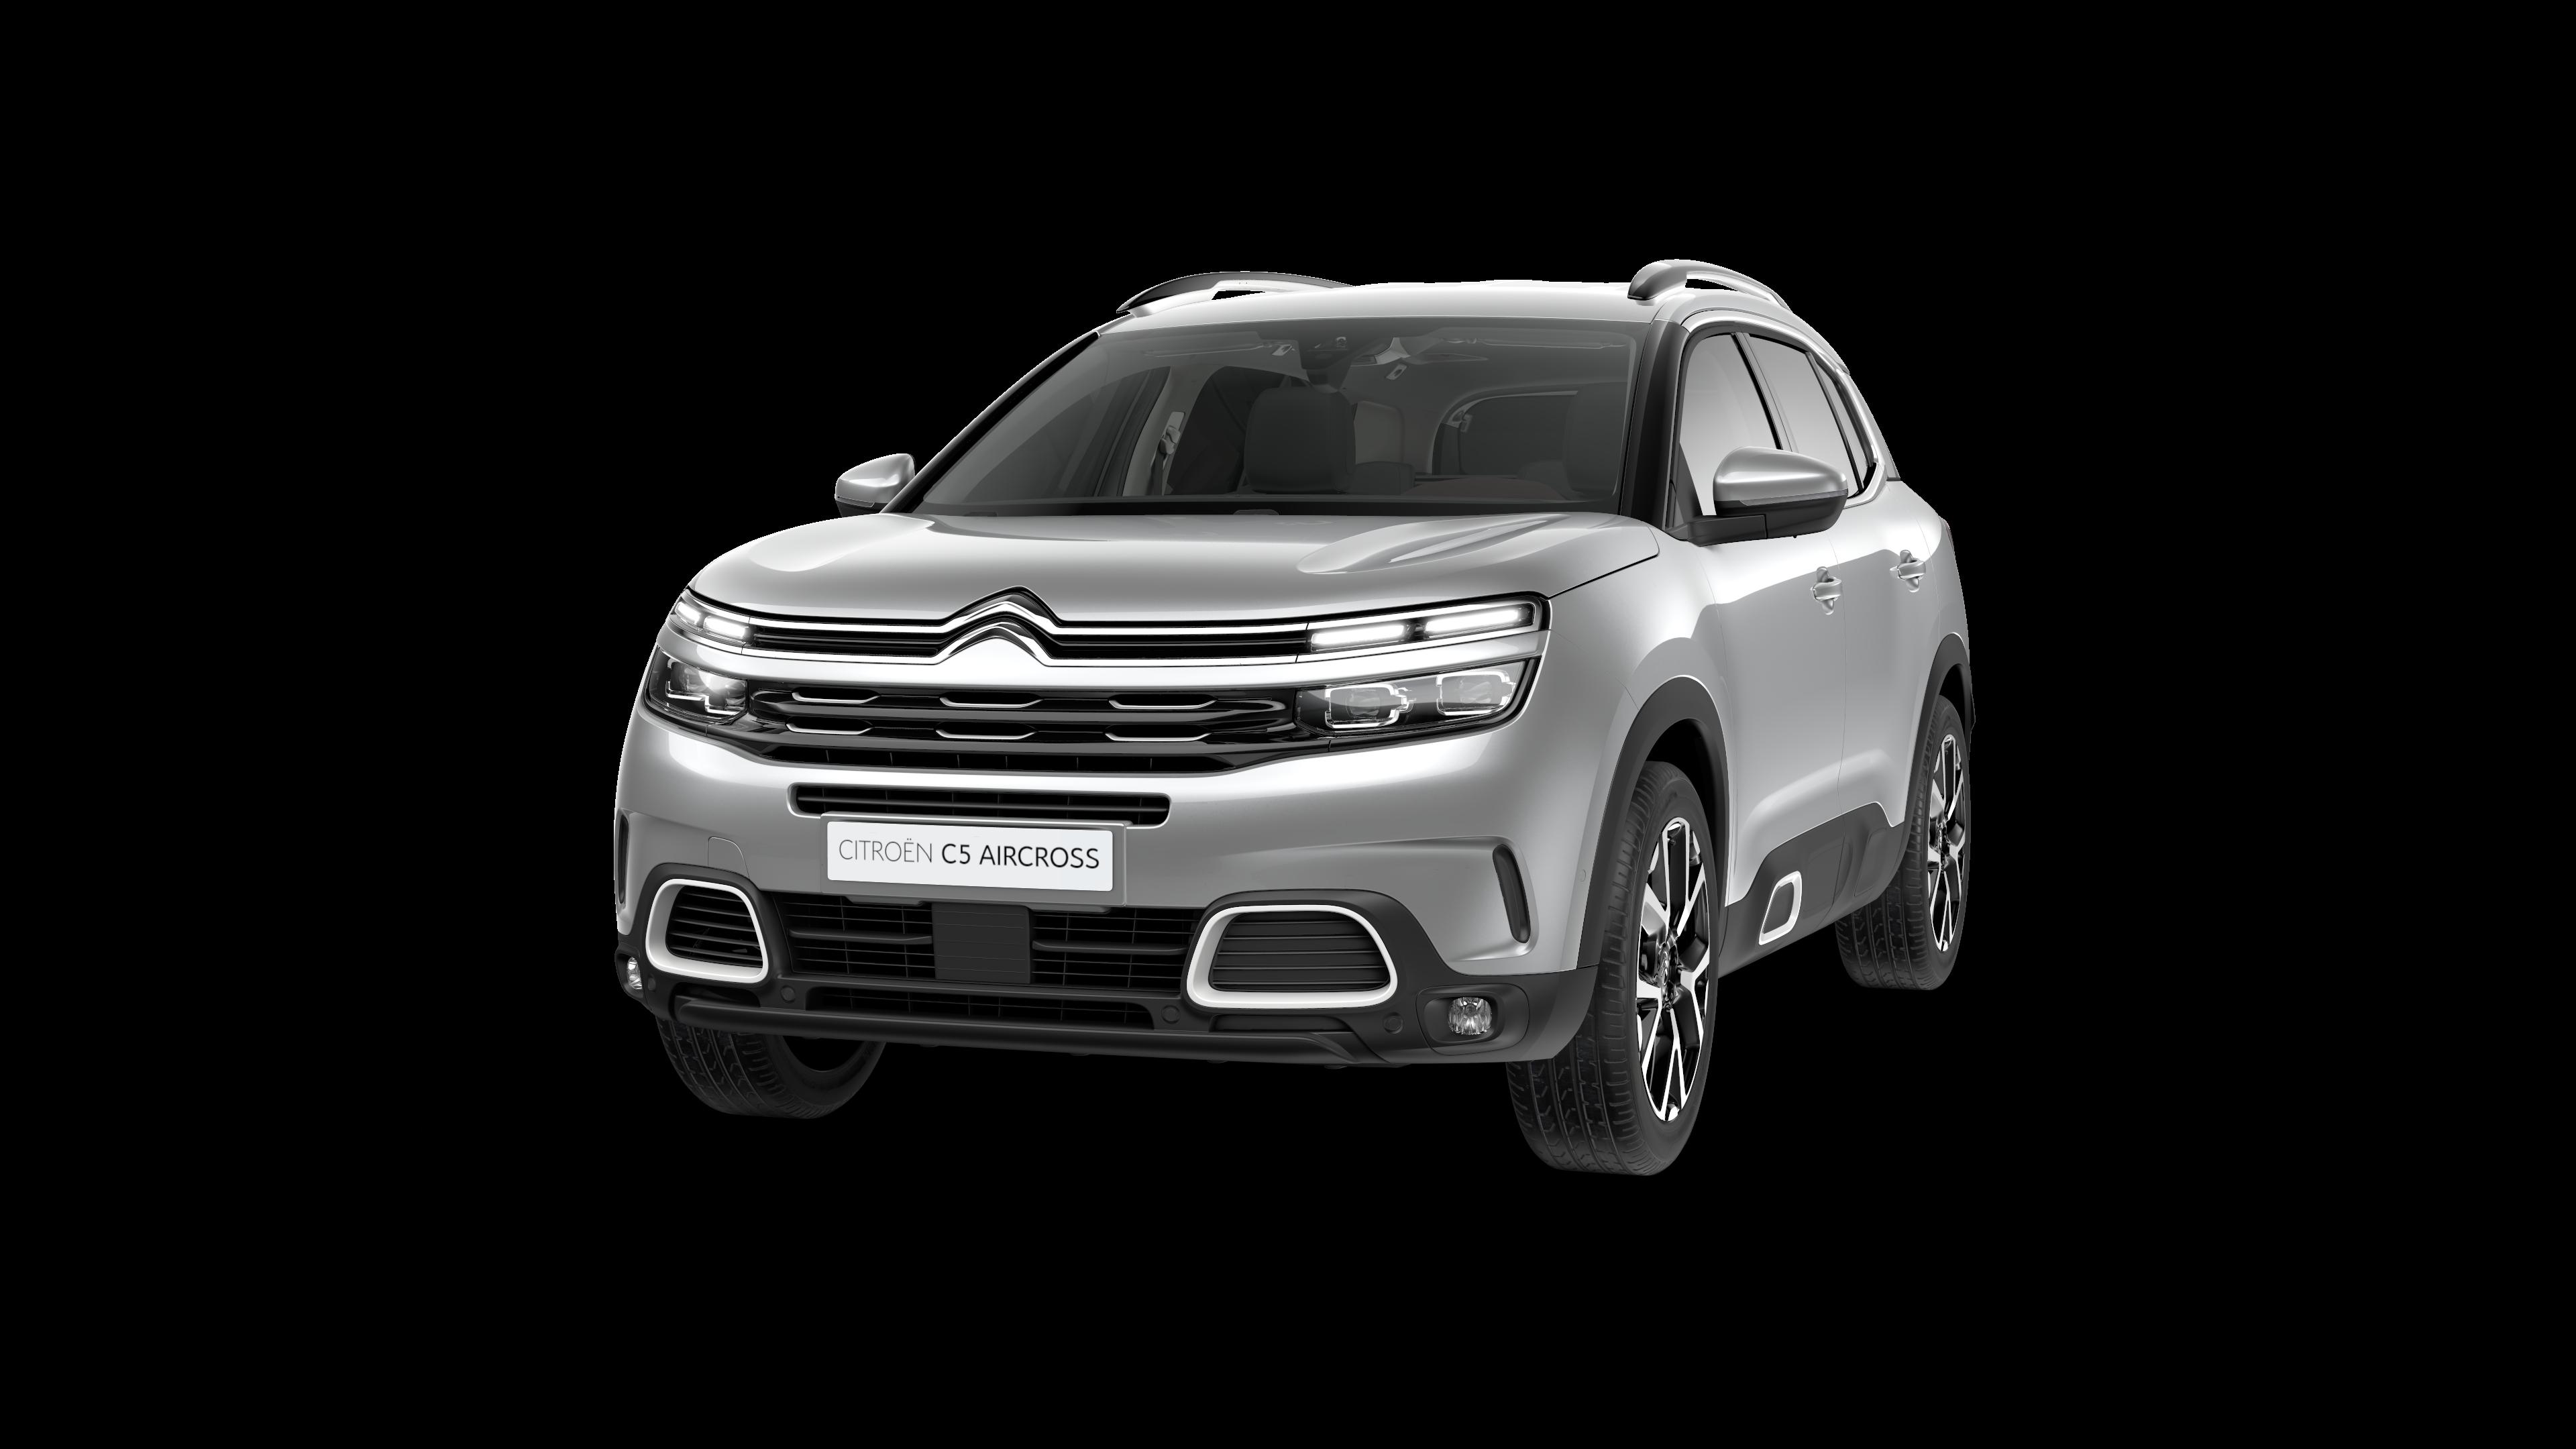 Citroën SUV C5 Aircross en gris acier